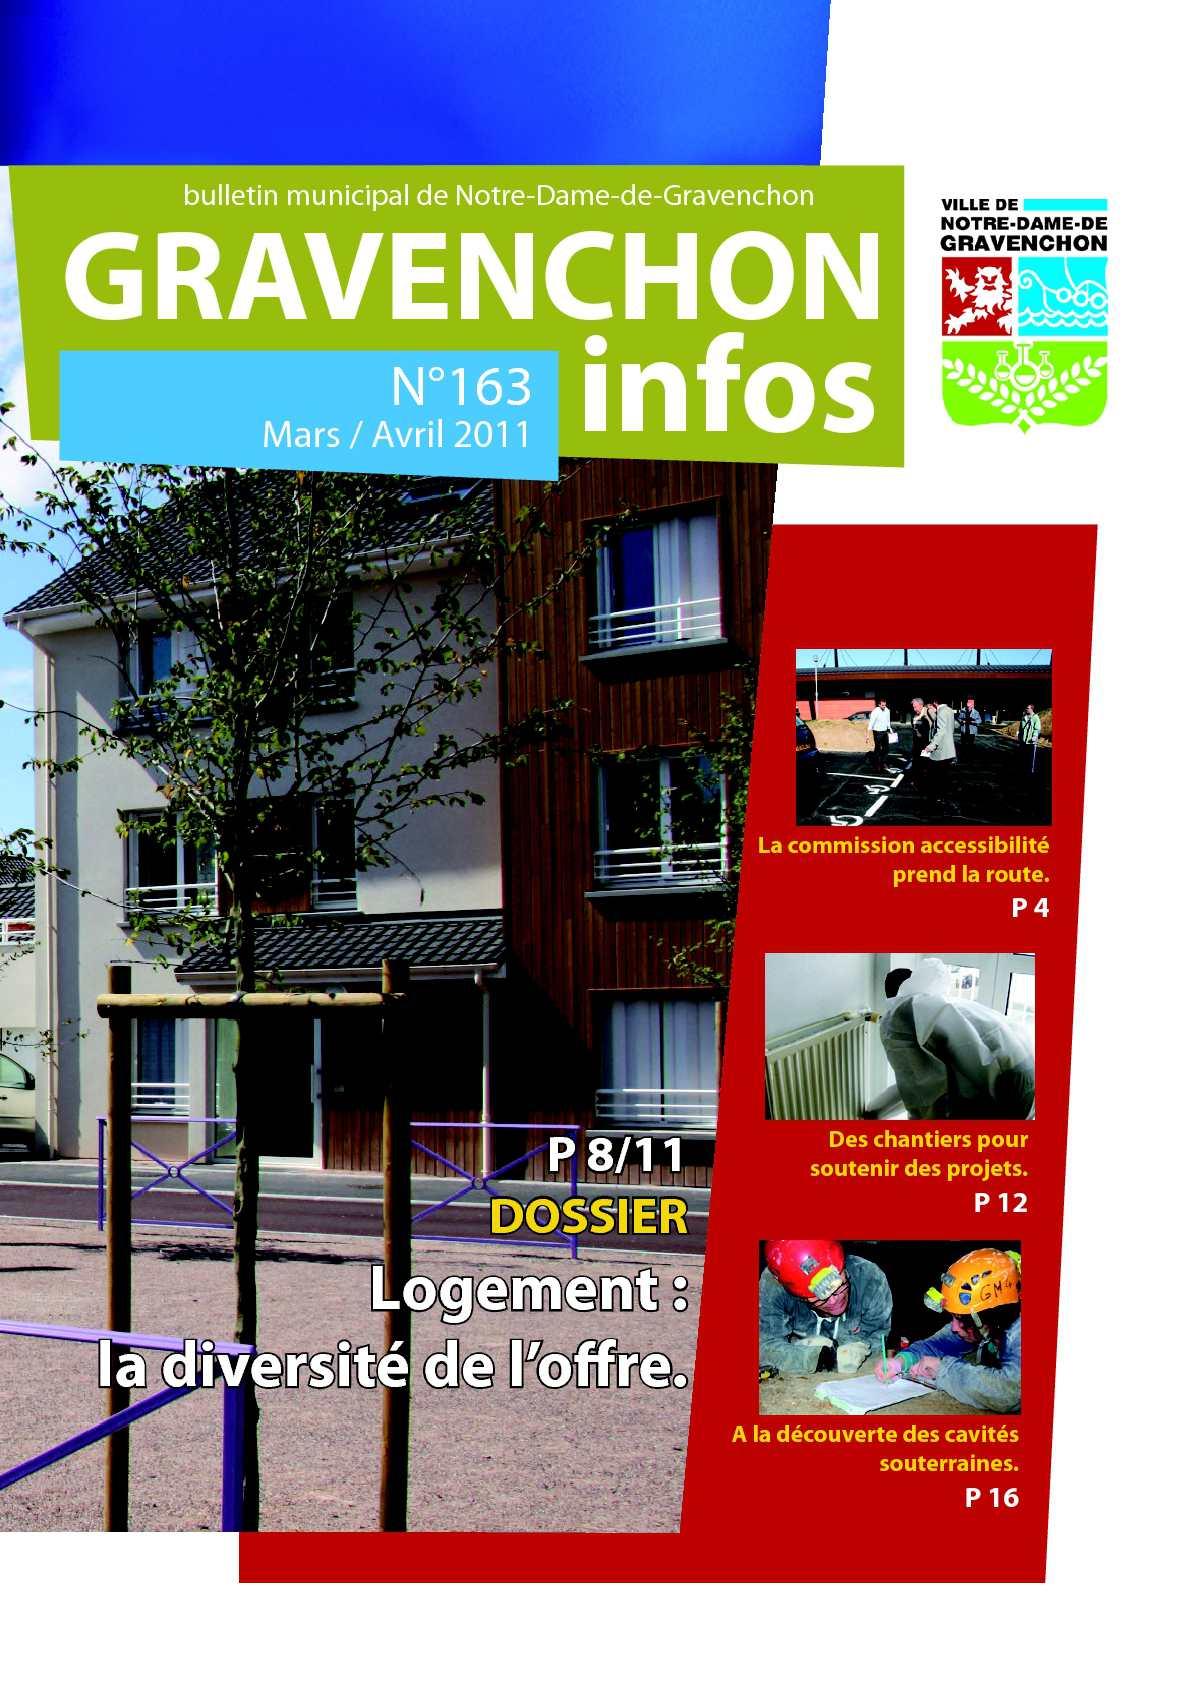 Calam o gravenchon infos 163 mars avril 2011 - Notre dame de gravenchon piscine ...